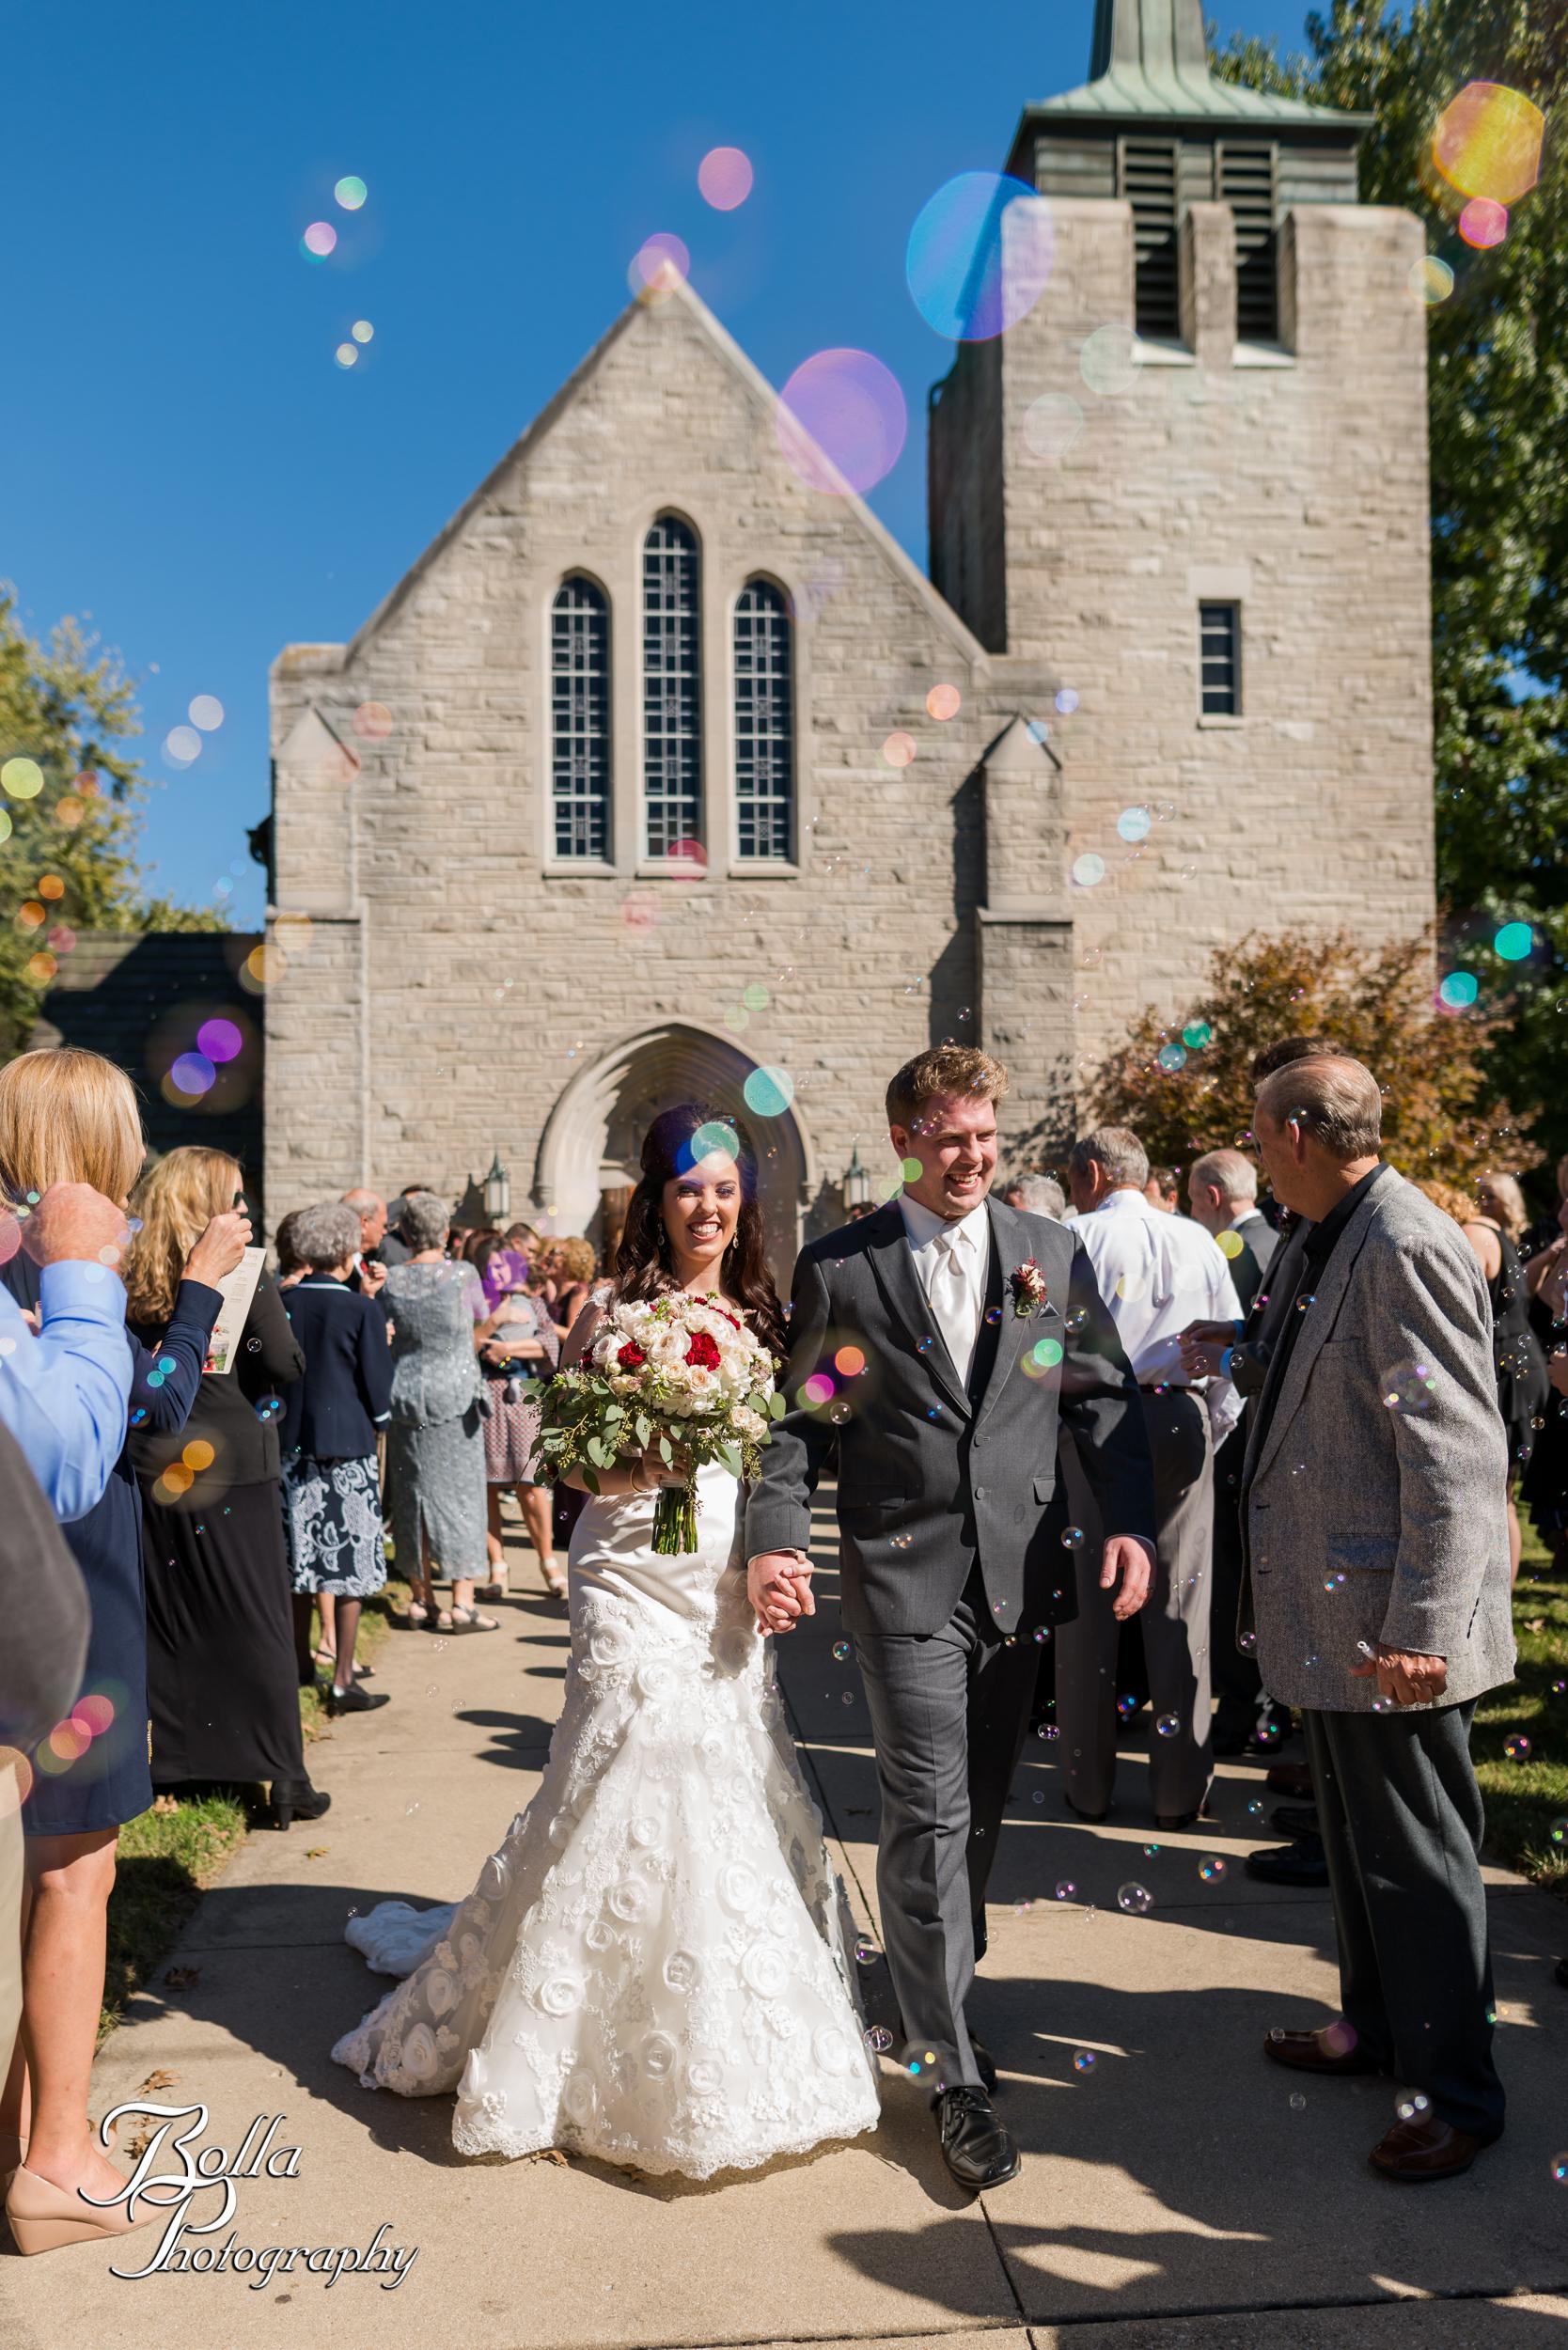 Bolla_photography_edwardsville_wedding_photographer_st_louis_weddings_Reilmann-0236.jpg